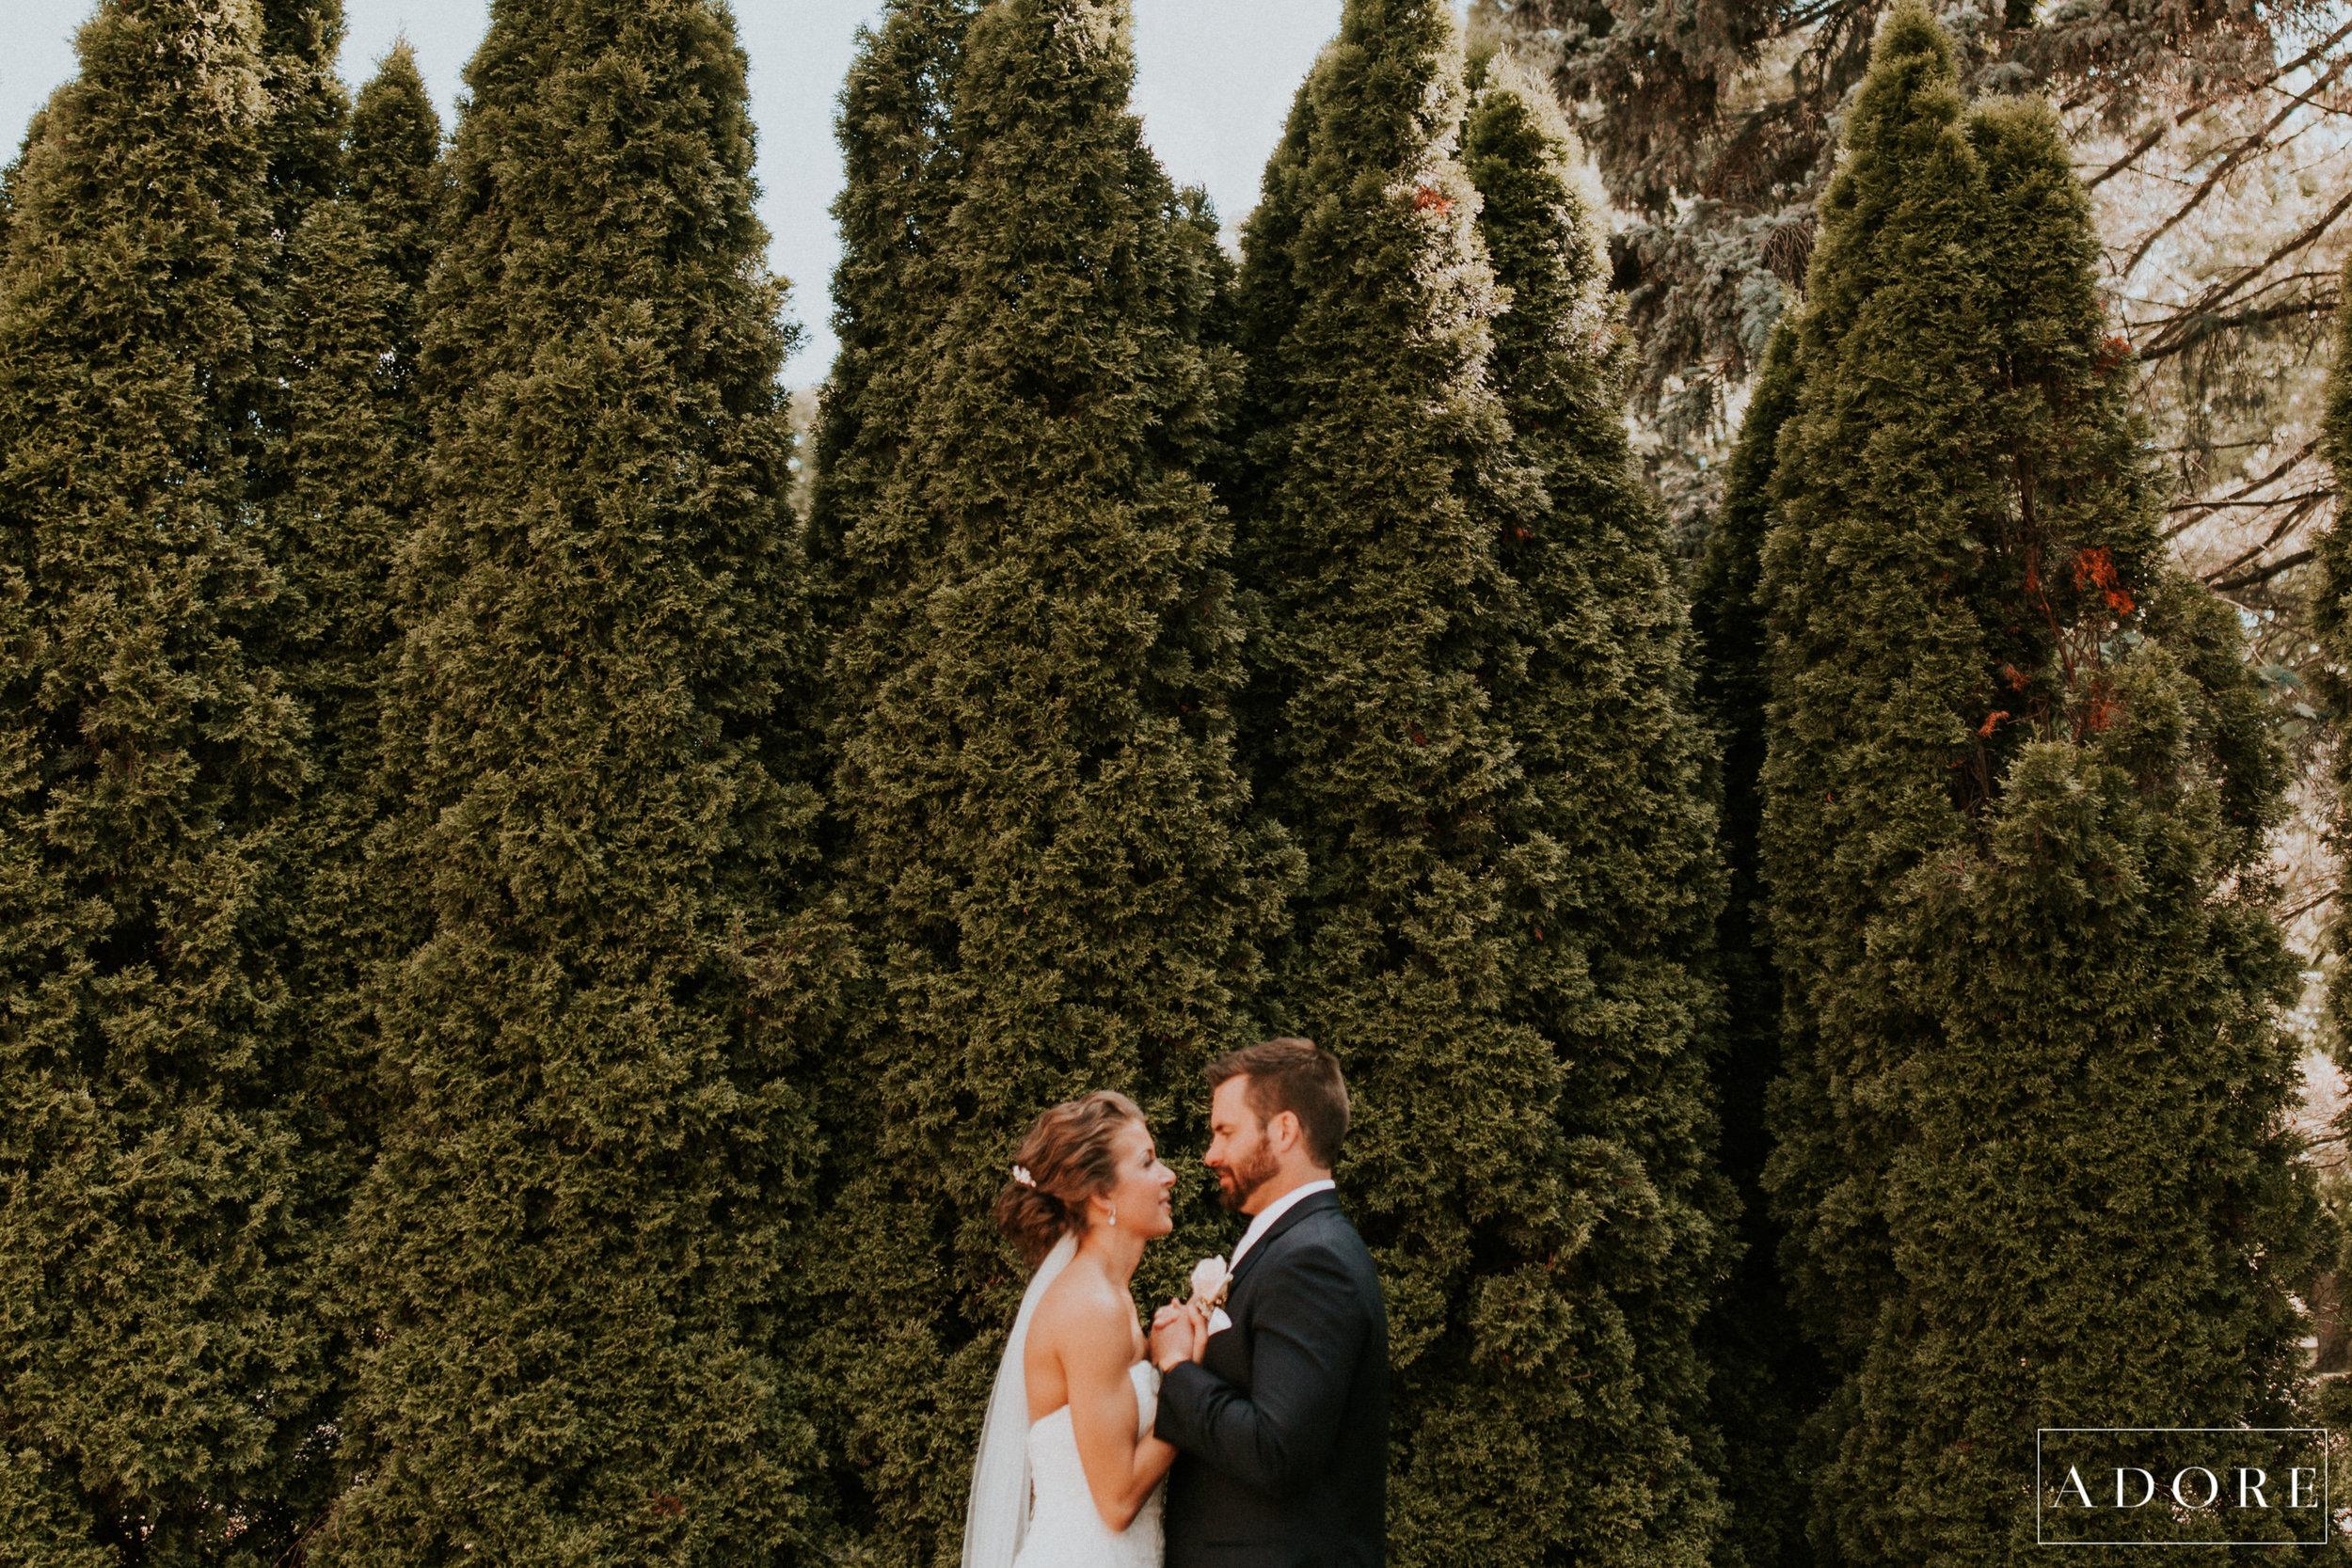 Adore Wedding Photography-21008.jpg